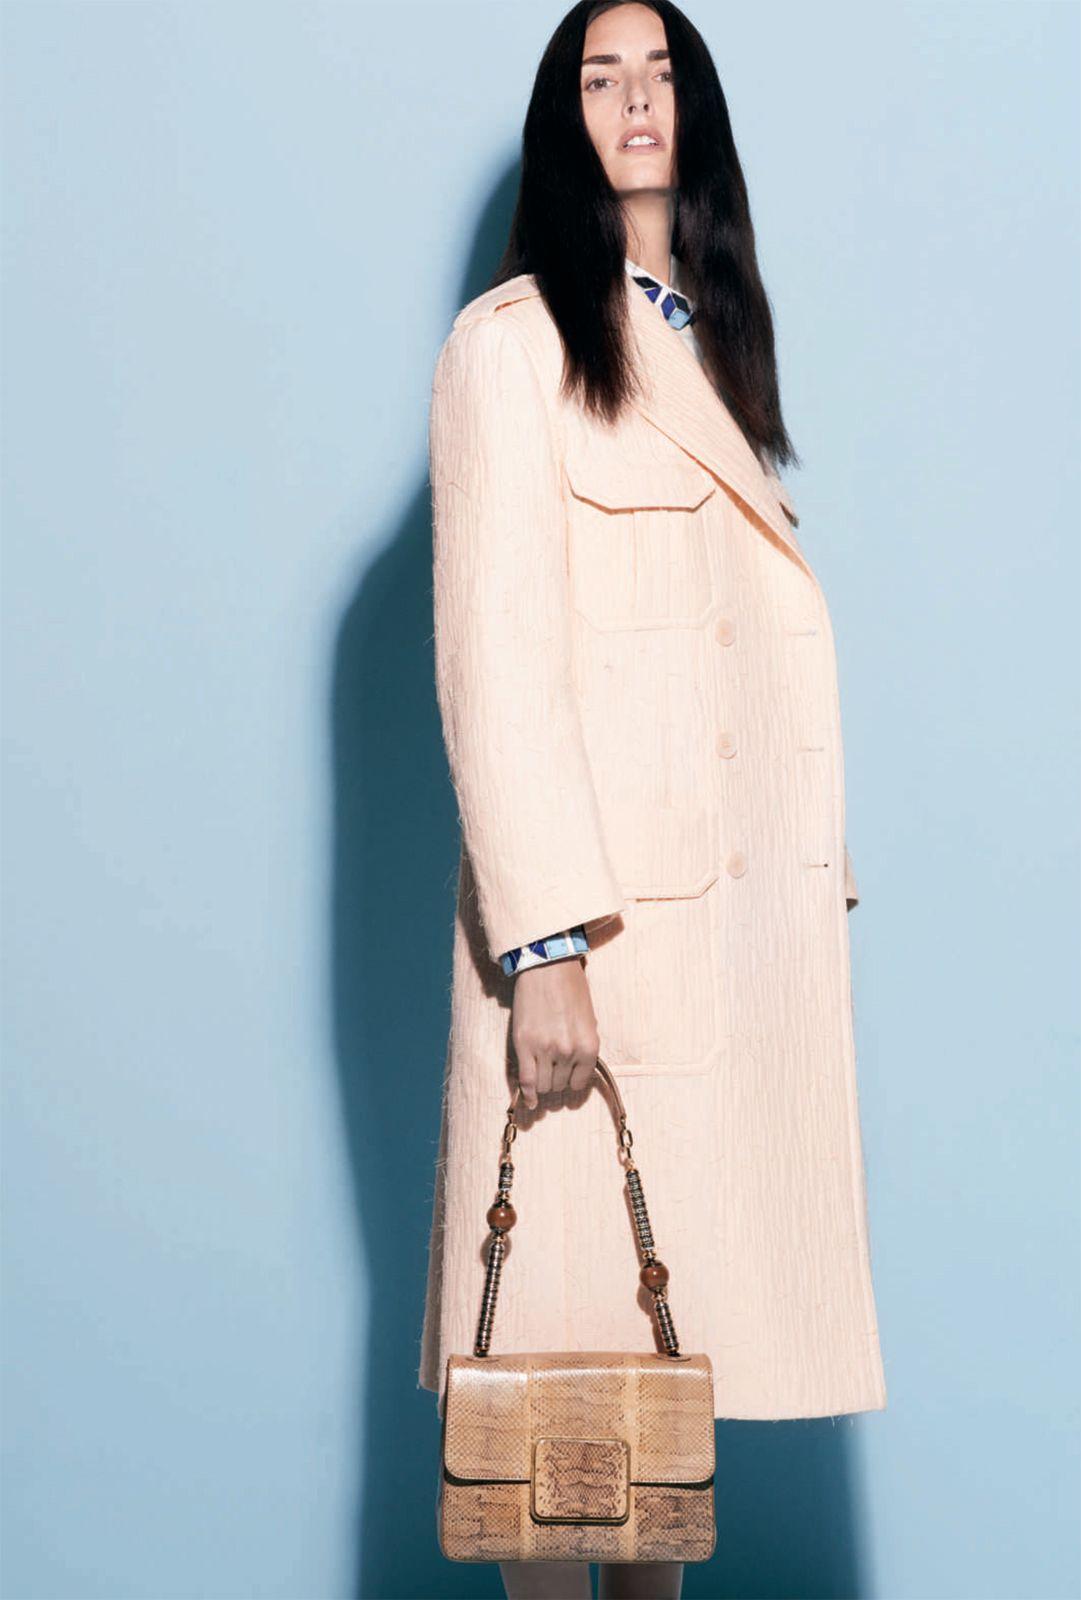 Modele lookbook – Broderies Sonia Rykiel – Perles effet 3D detail col et poignet – Printemps ete 2013 – 2